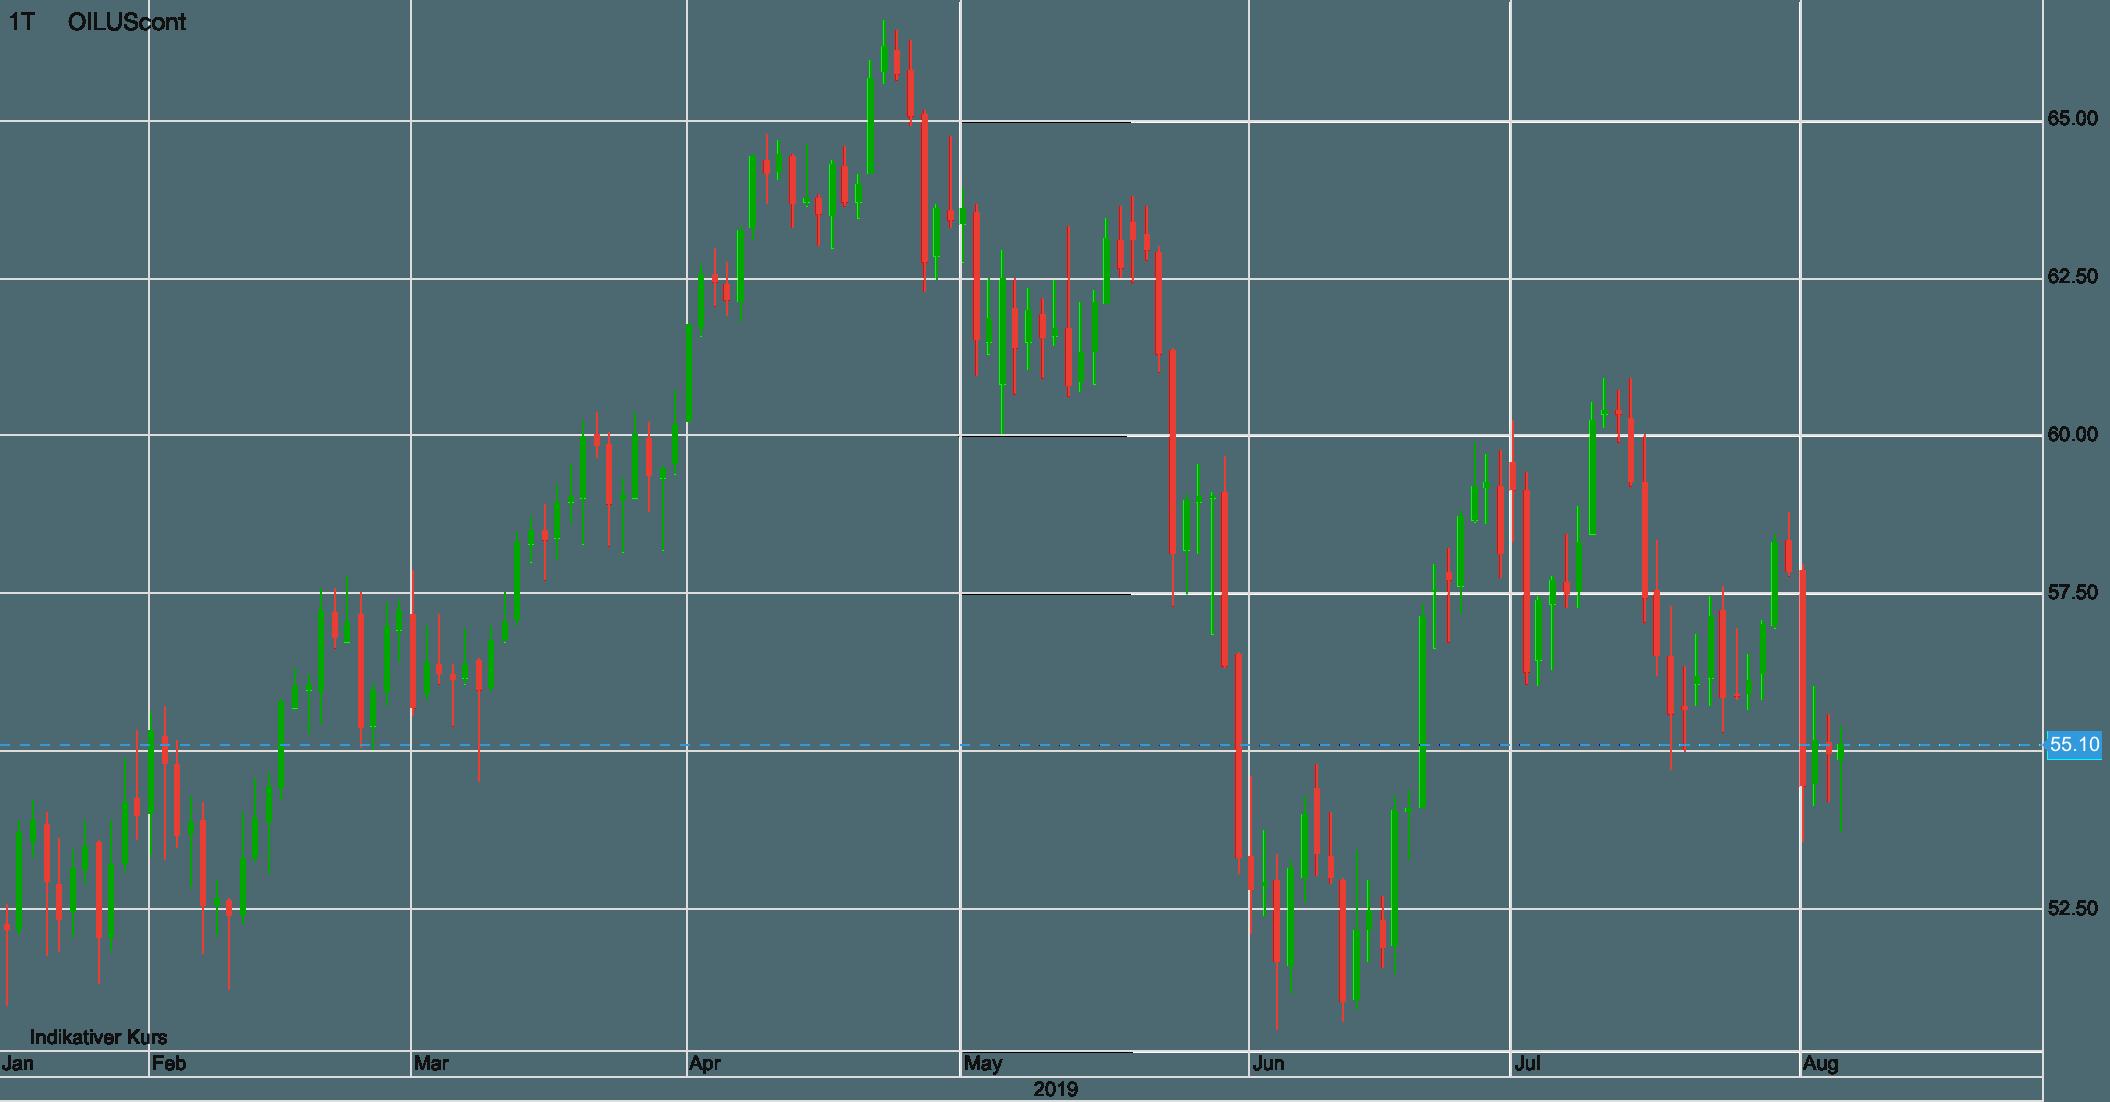 WTI-Ölpreis im größeren Bild seit Januar